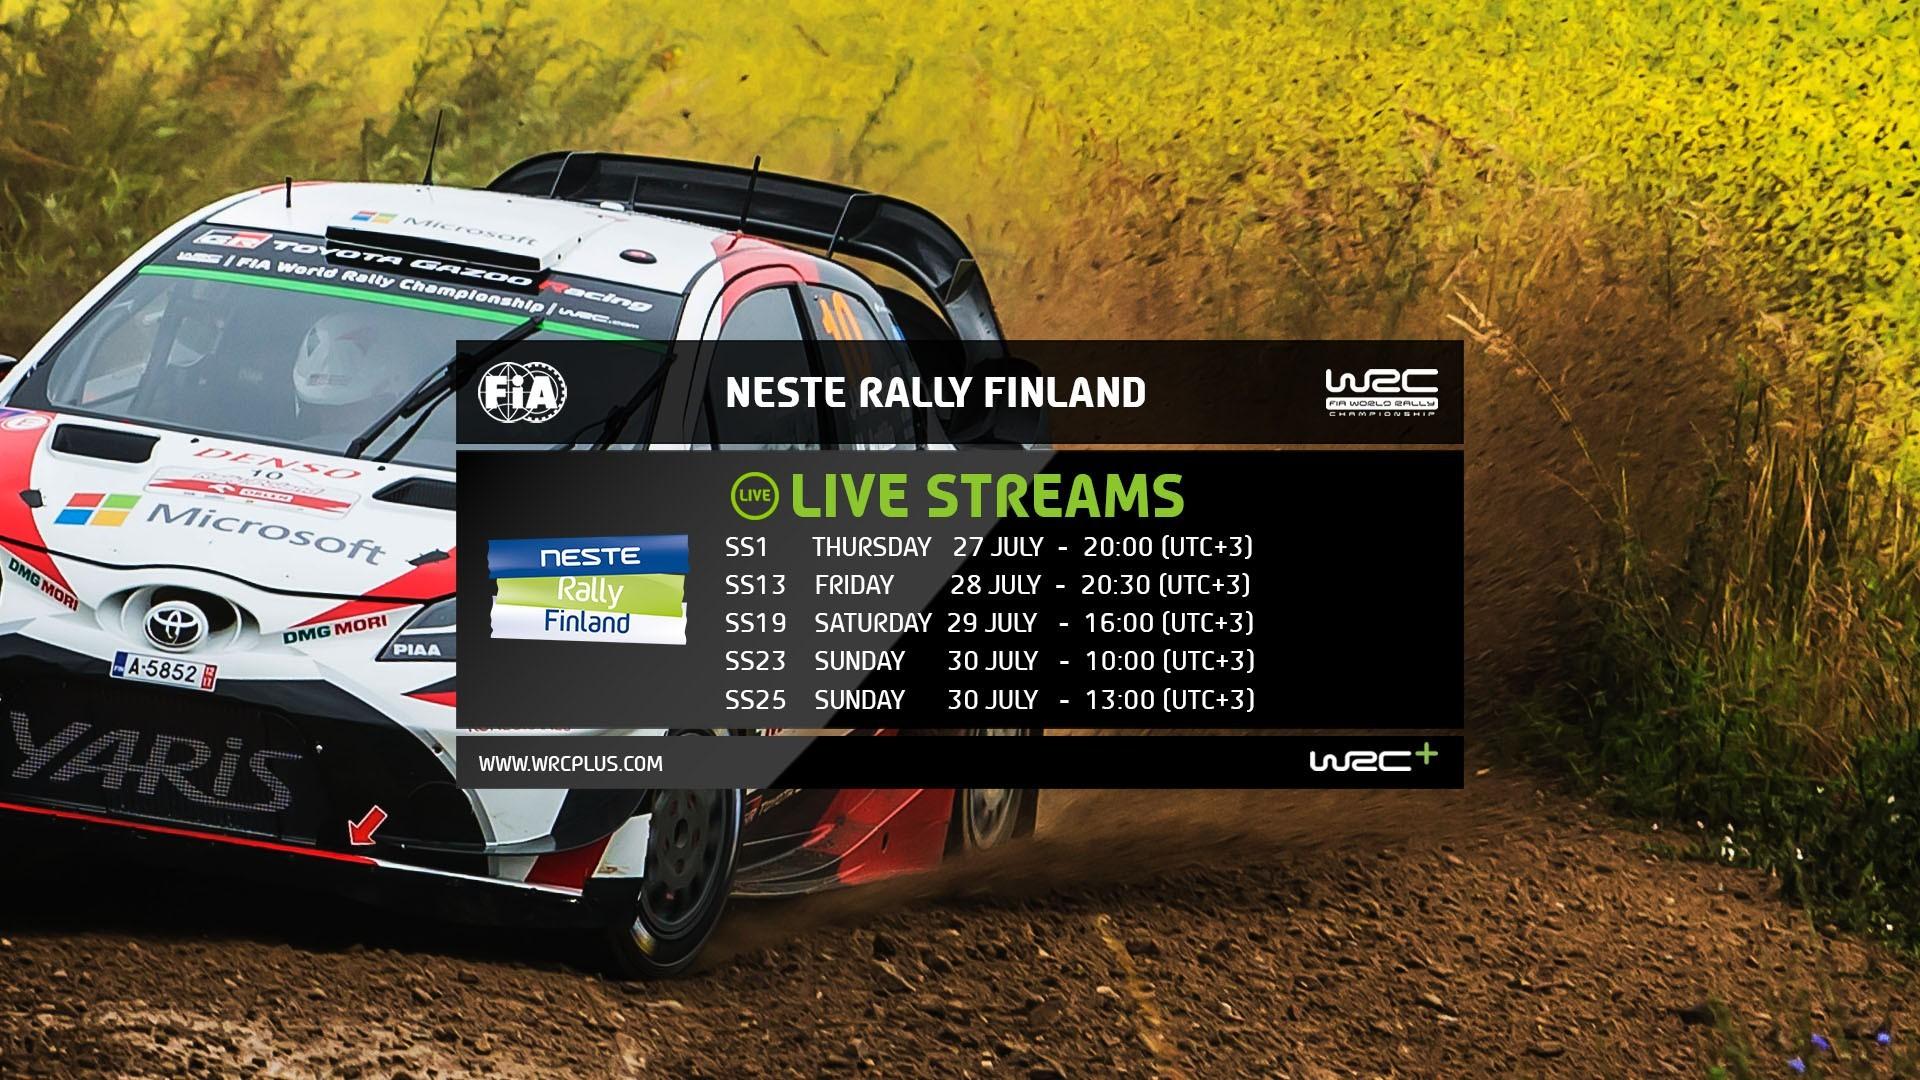 rally-de-finlandia-plus-wrc-2017.jpg